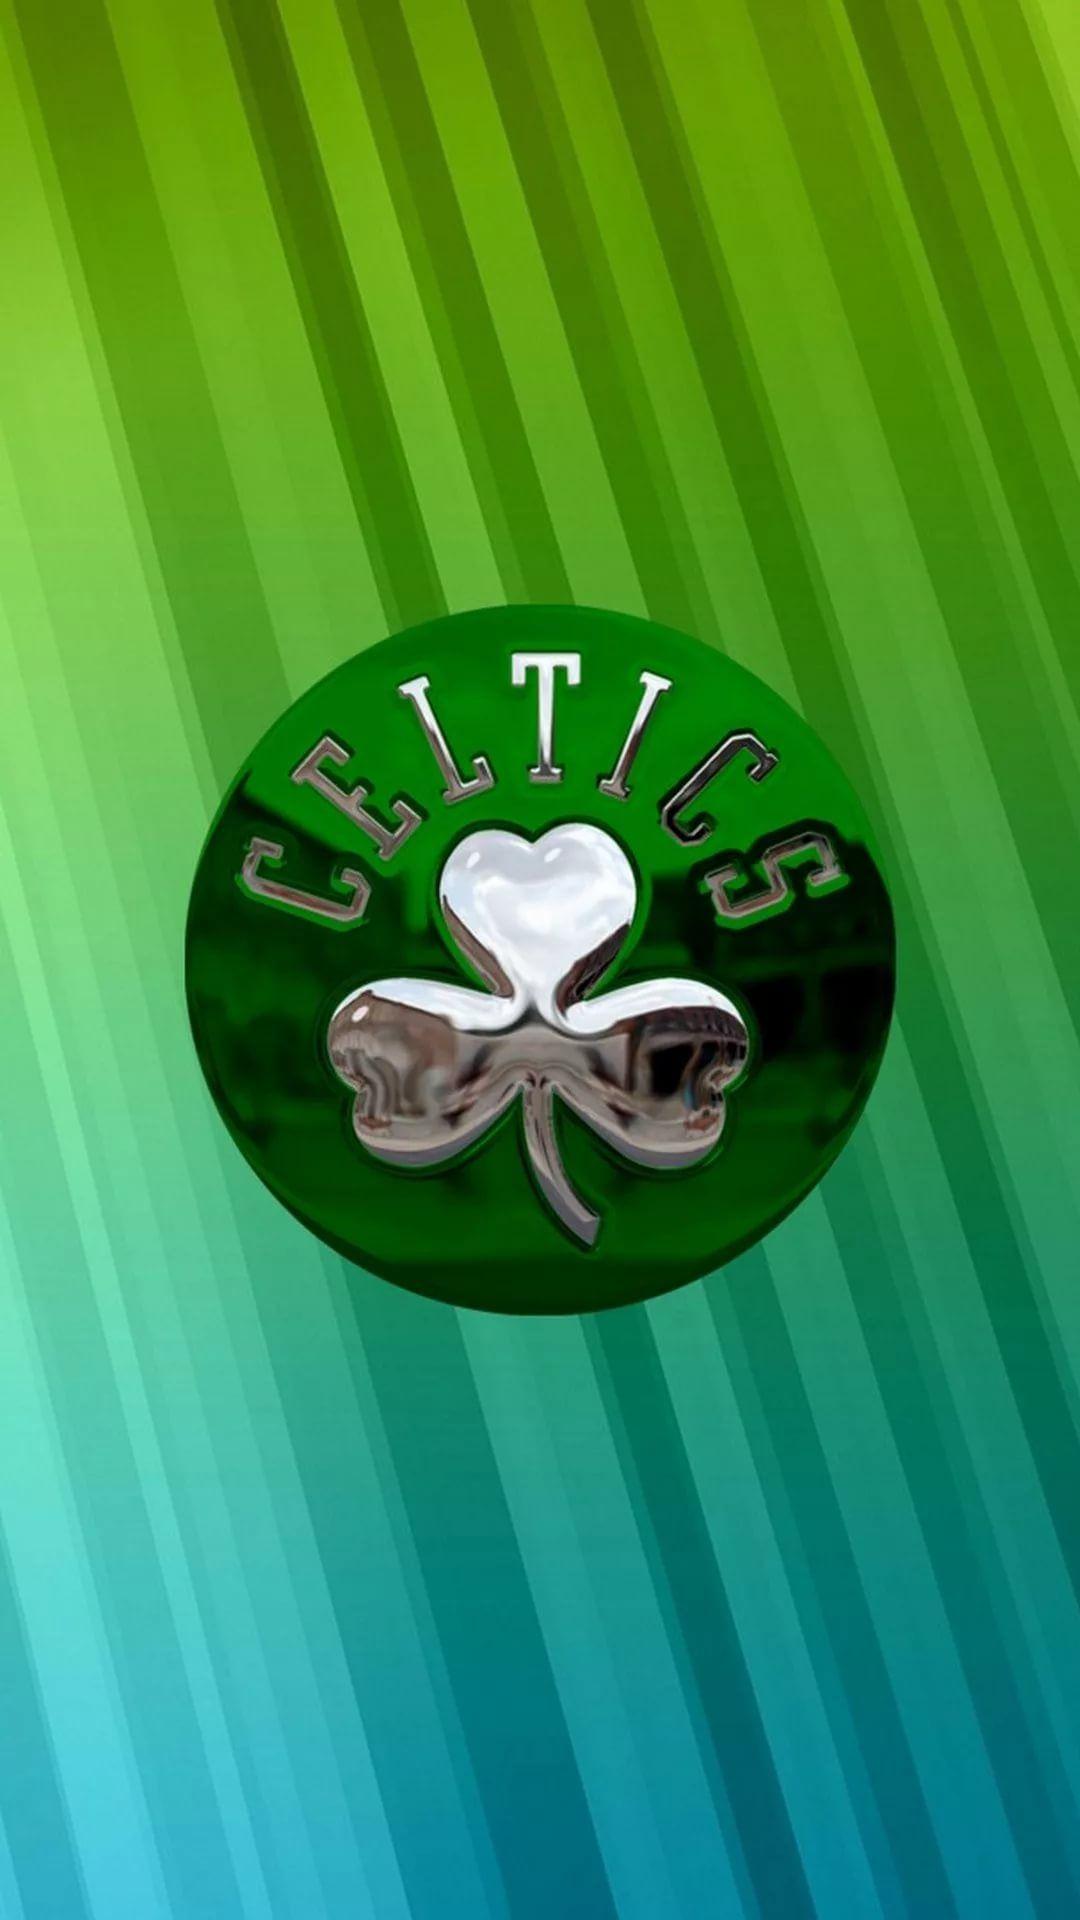 Celtic Fc phone background